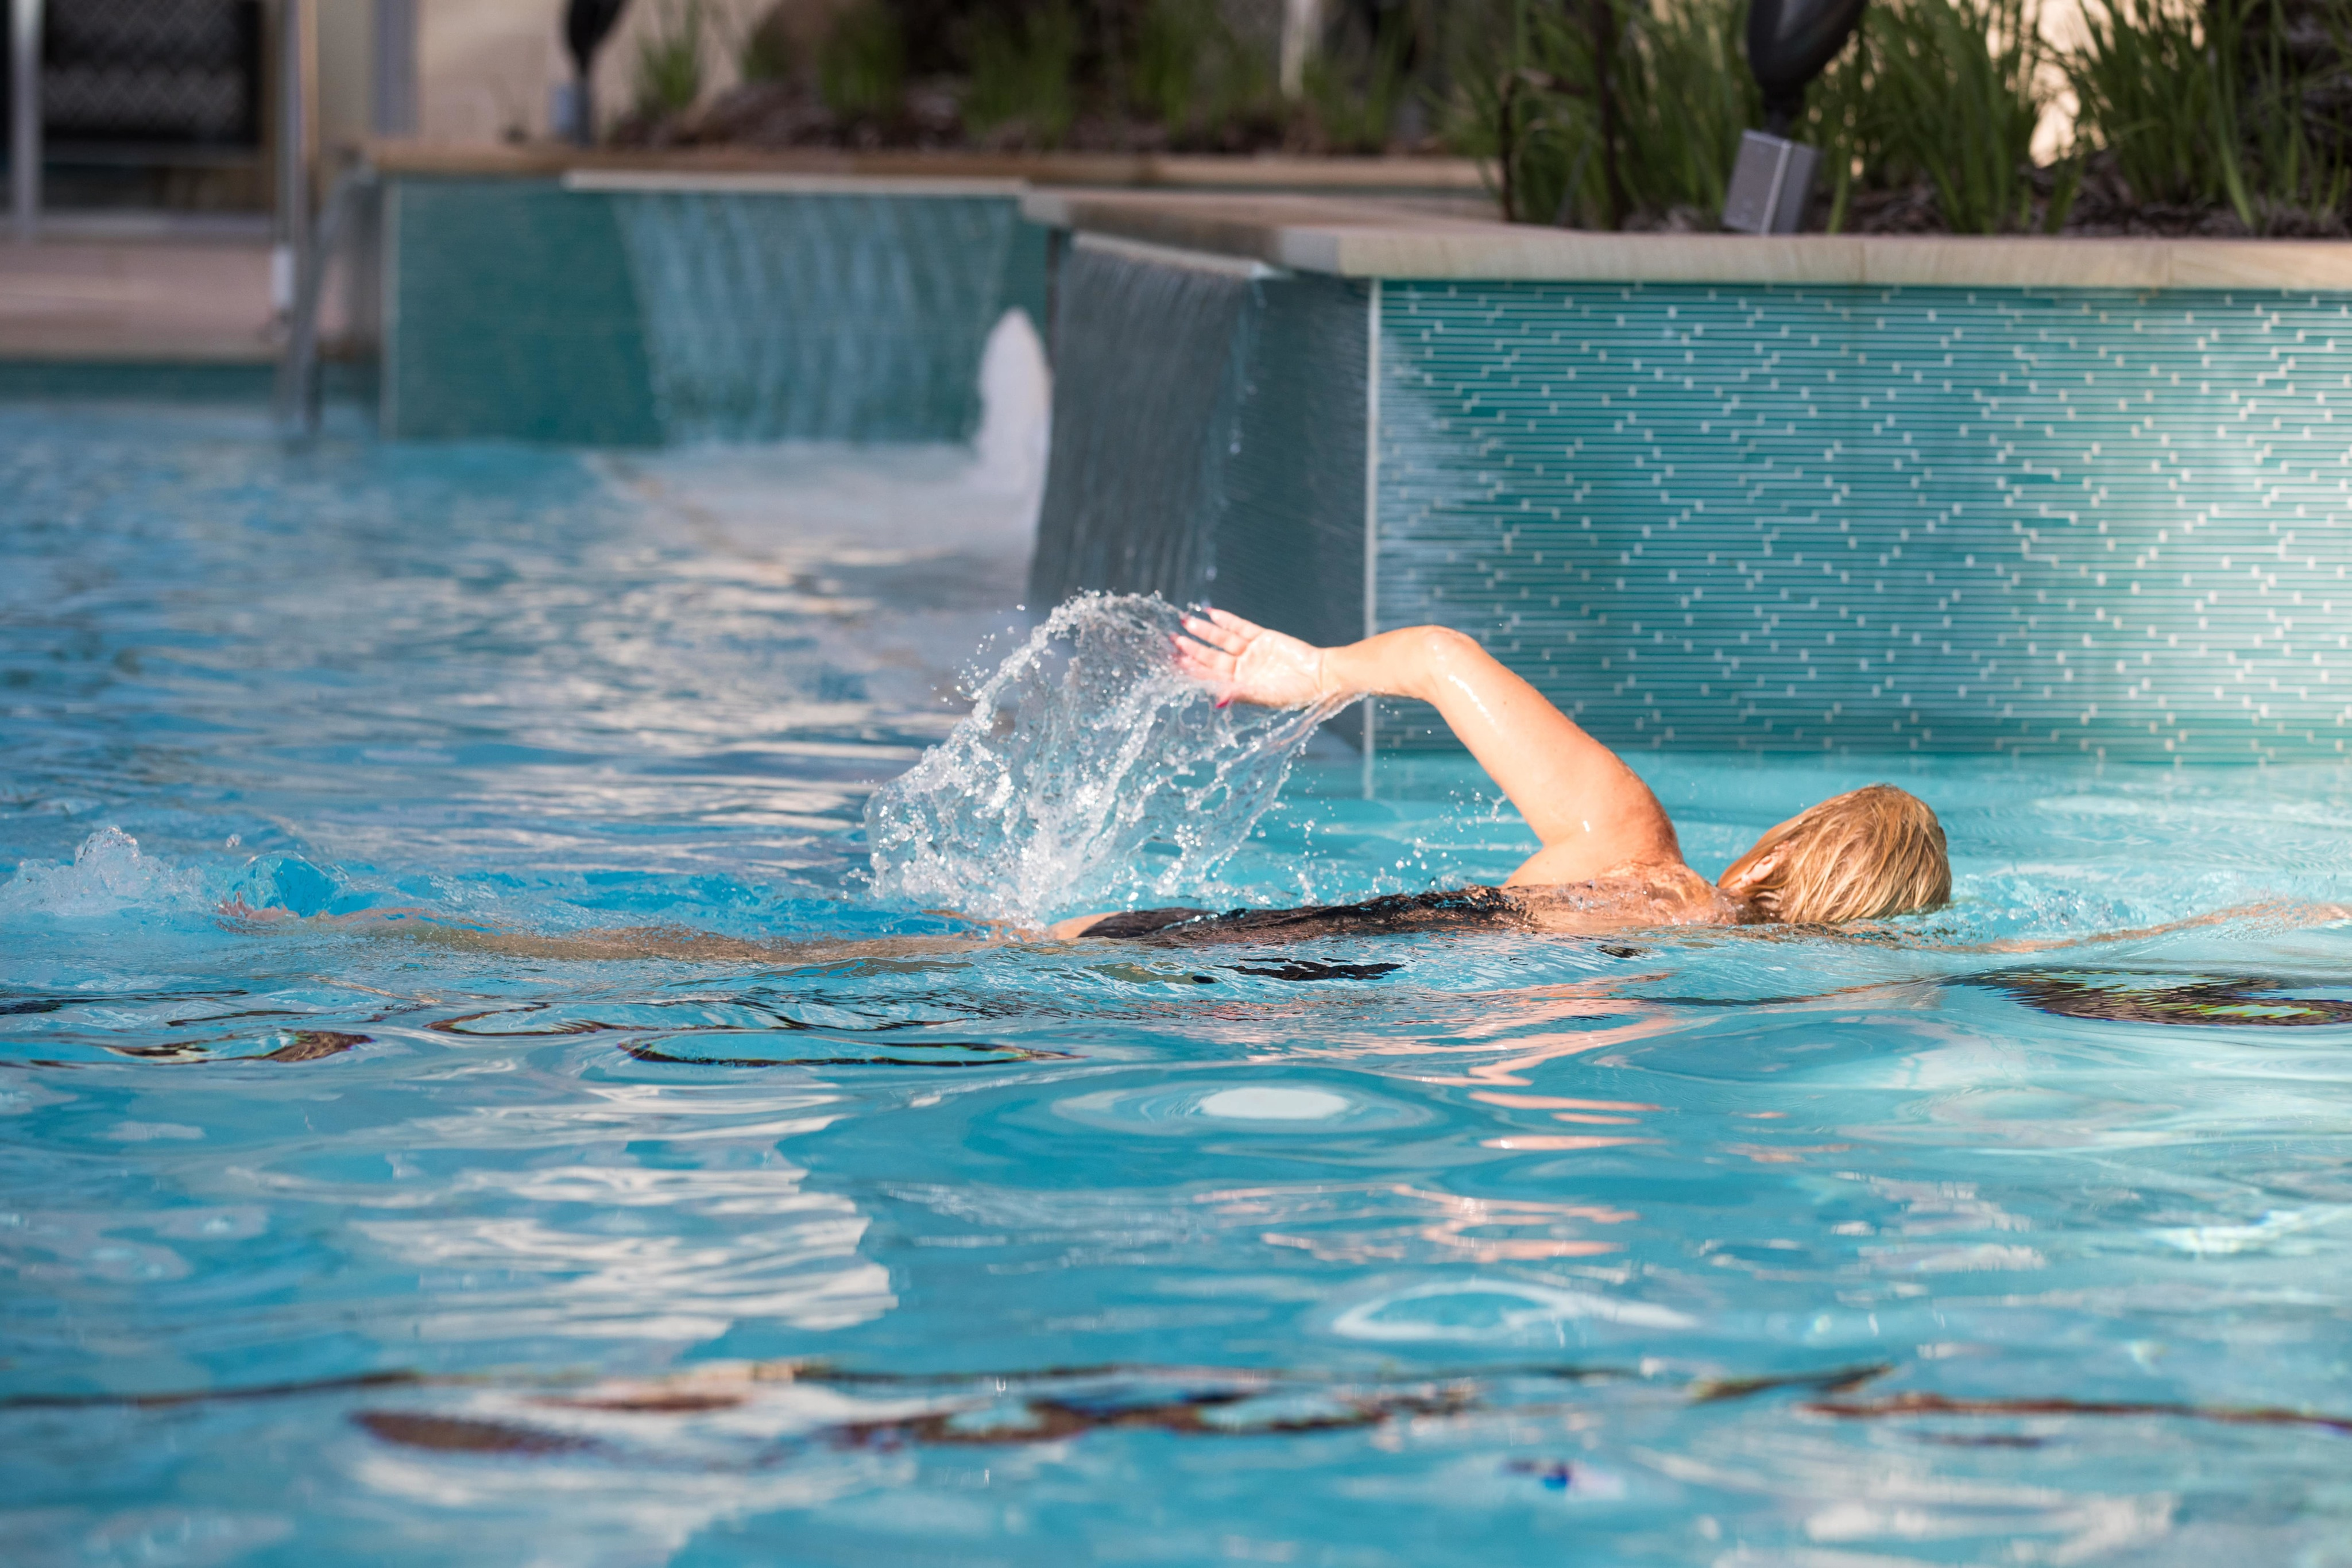 enior-female-swimming-in-Overture-pool